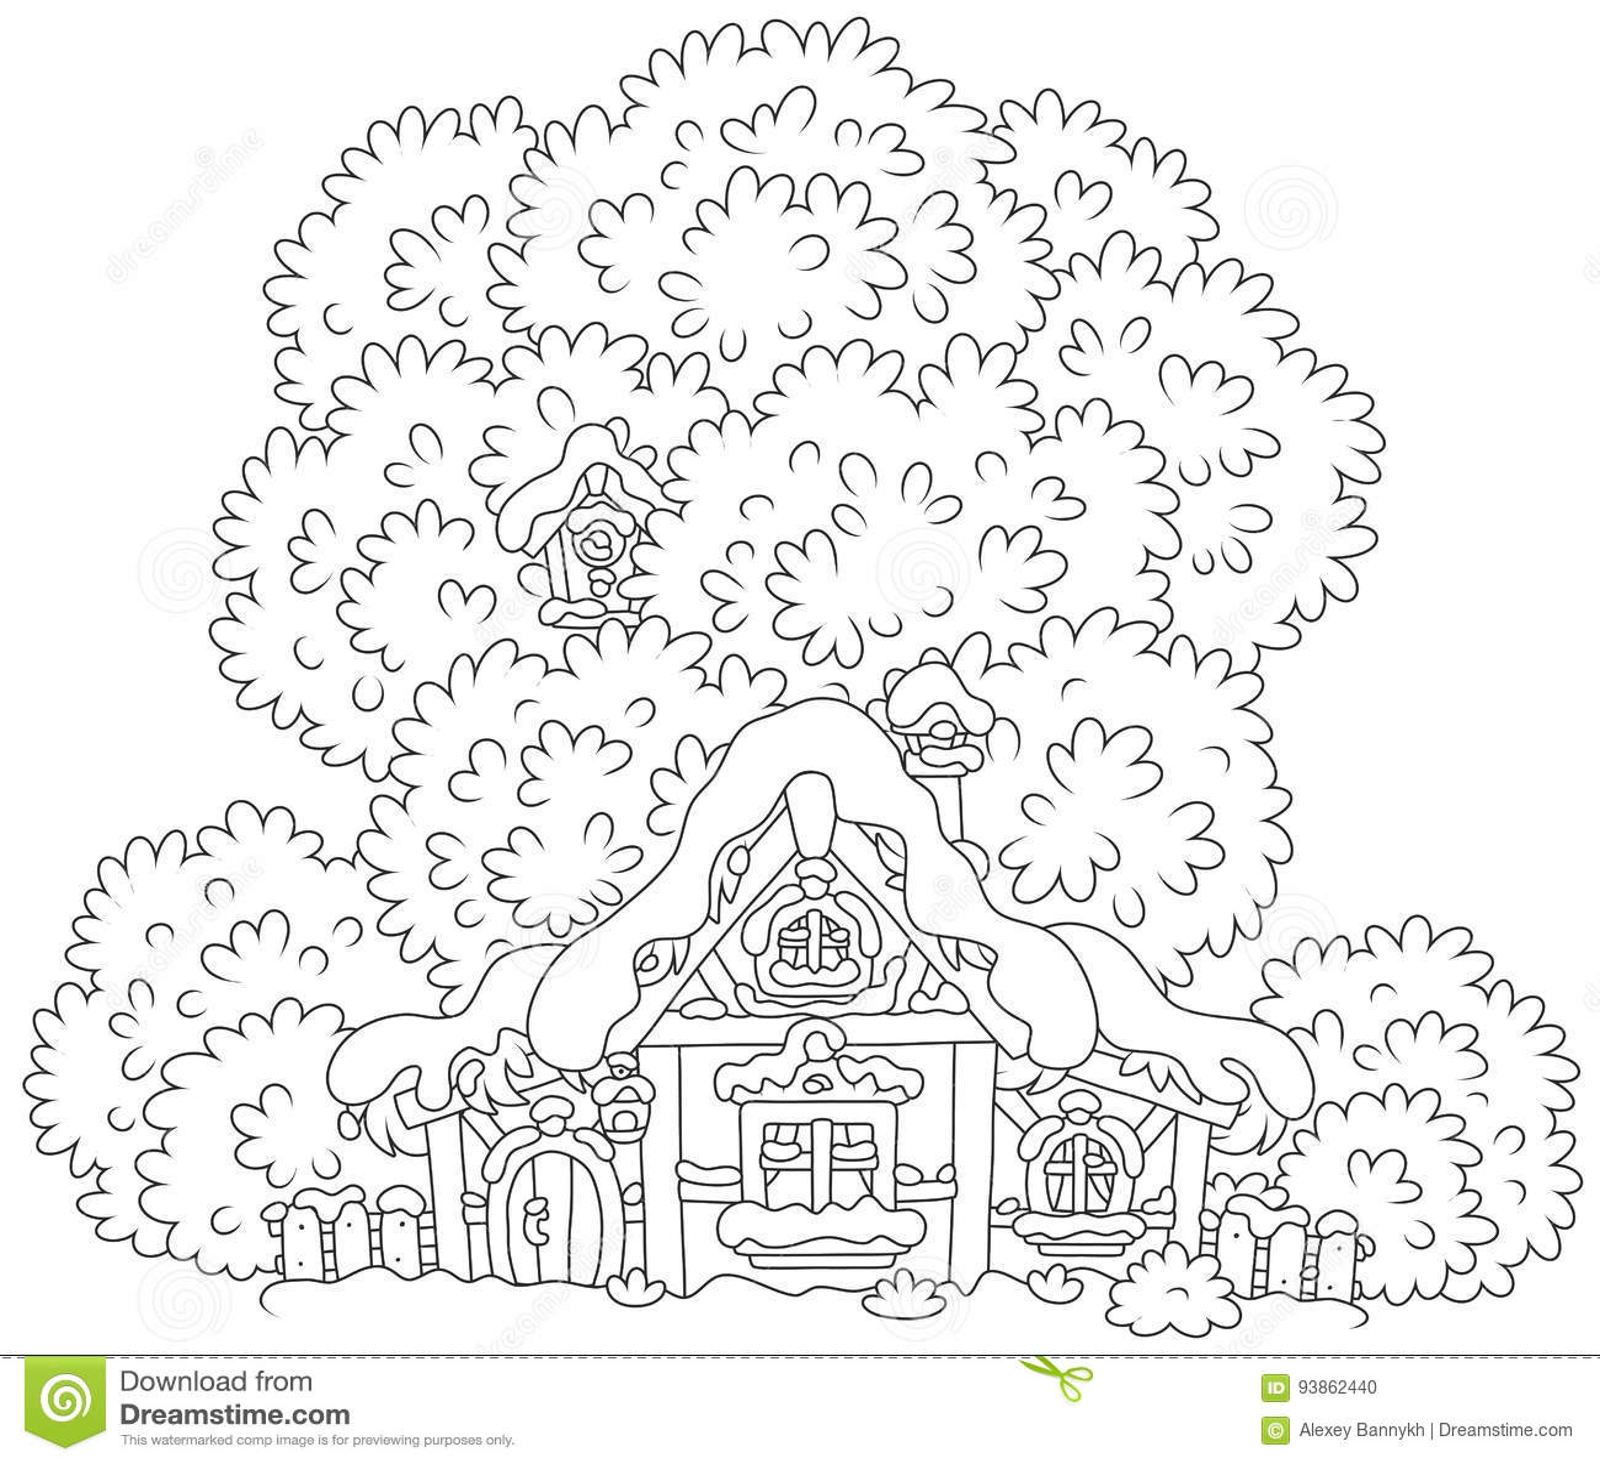 a hut roof